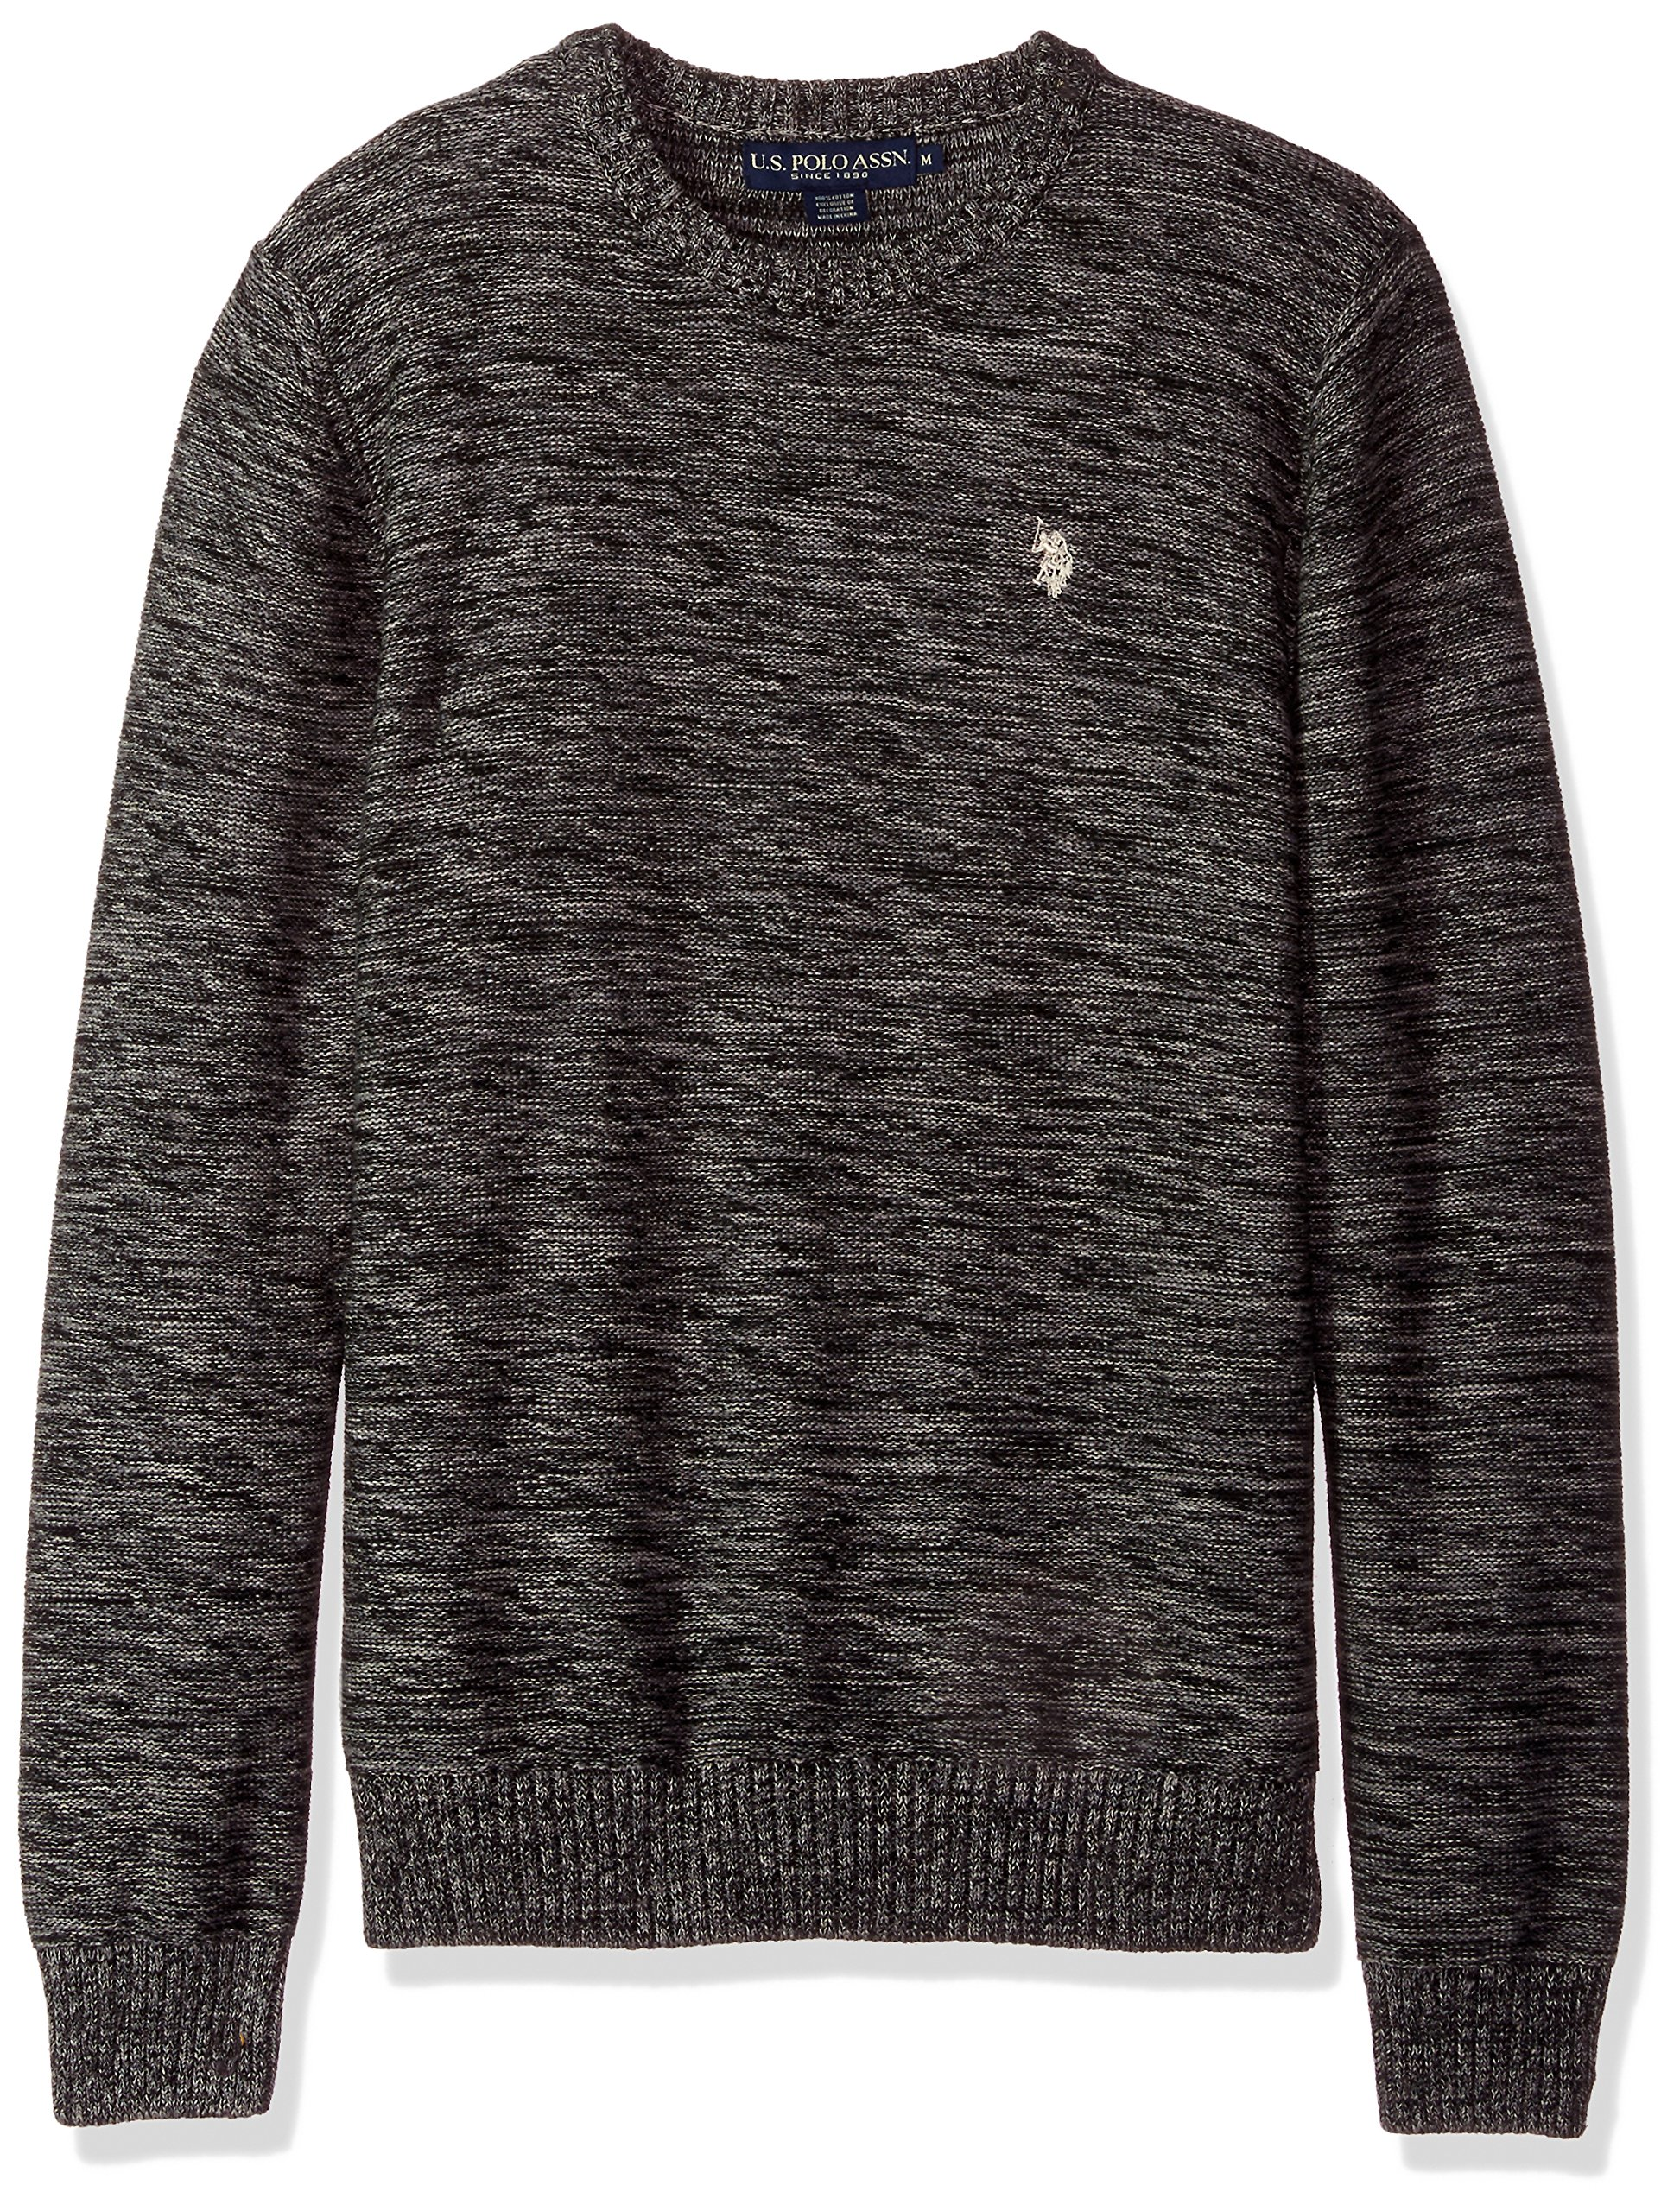 U.S. Polo Assn. Men's MARL Reverse Jersey Crew Neck Sweater, Coal MARL, Medium